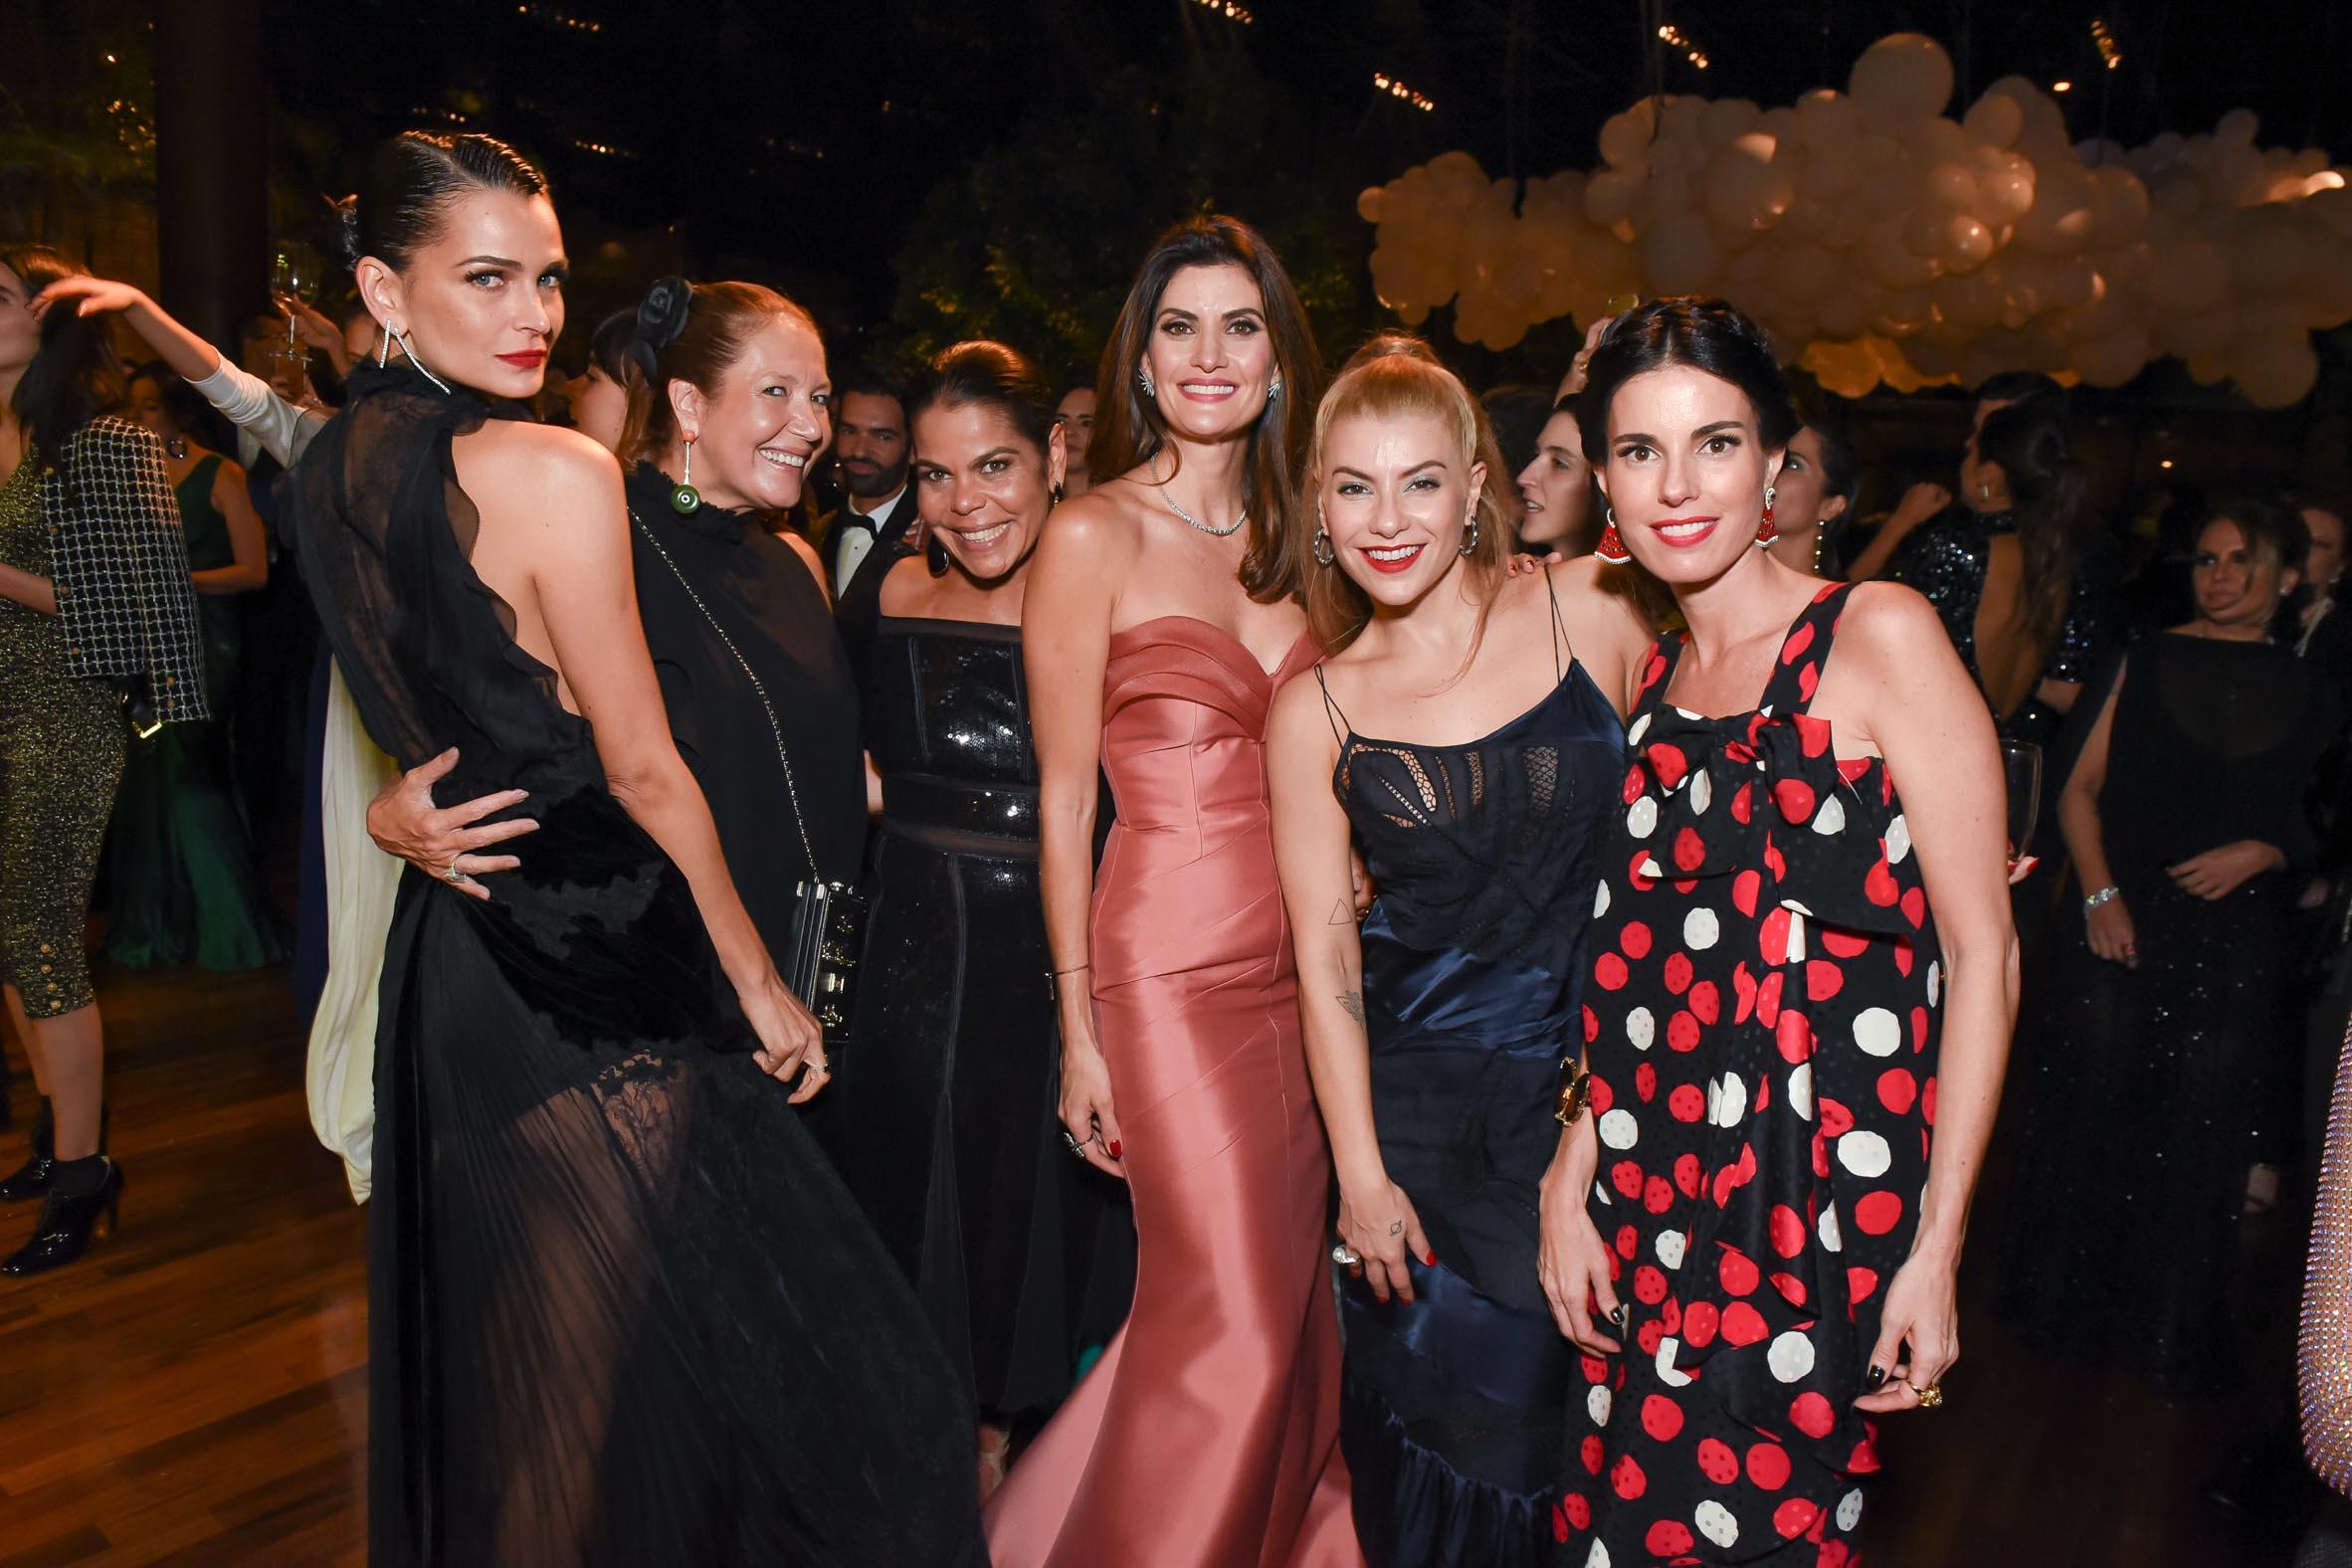 IV BrazilFoundation Gala São Paulo Fernanda Motta, Donata Meirelles, Daniela Falcao, Helo Rocha e Raquel Correa